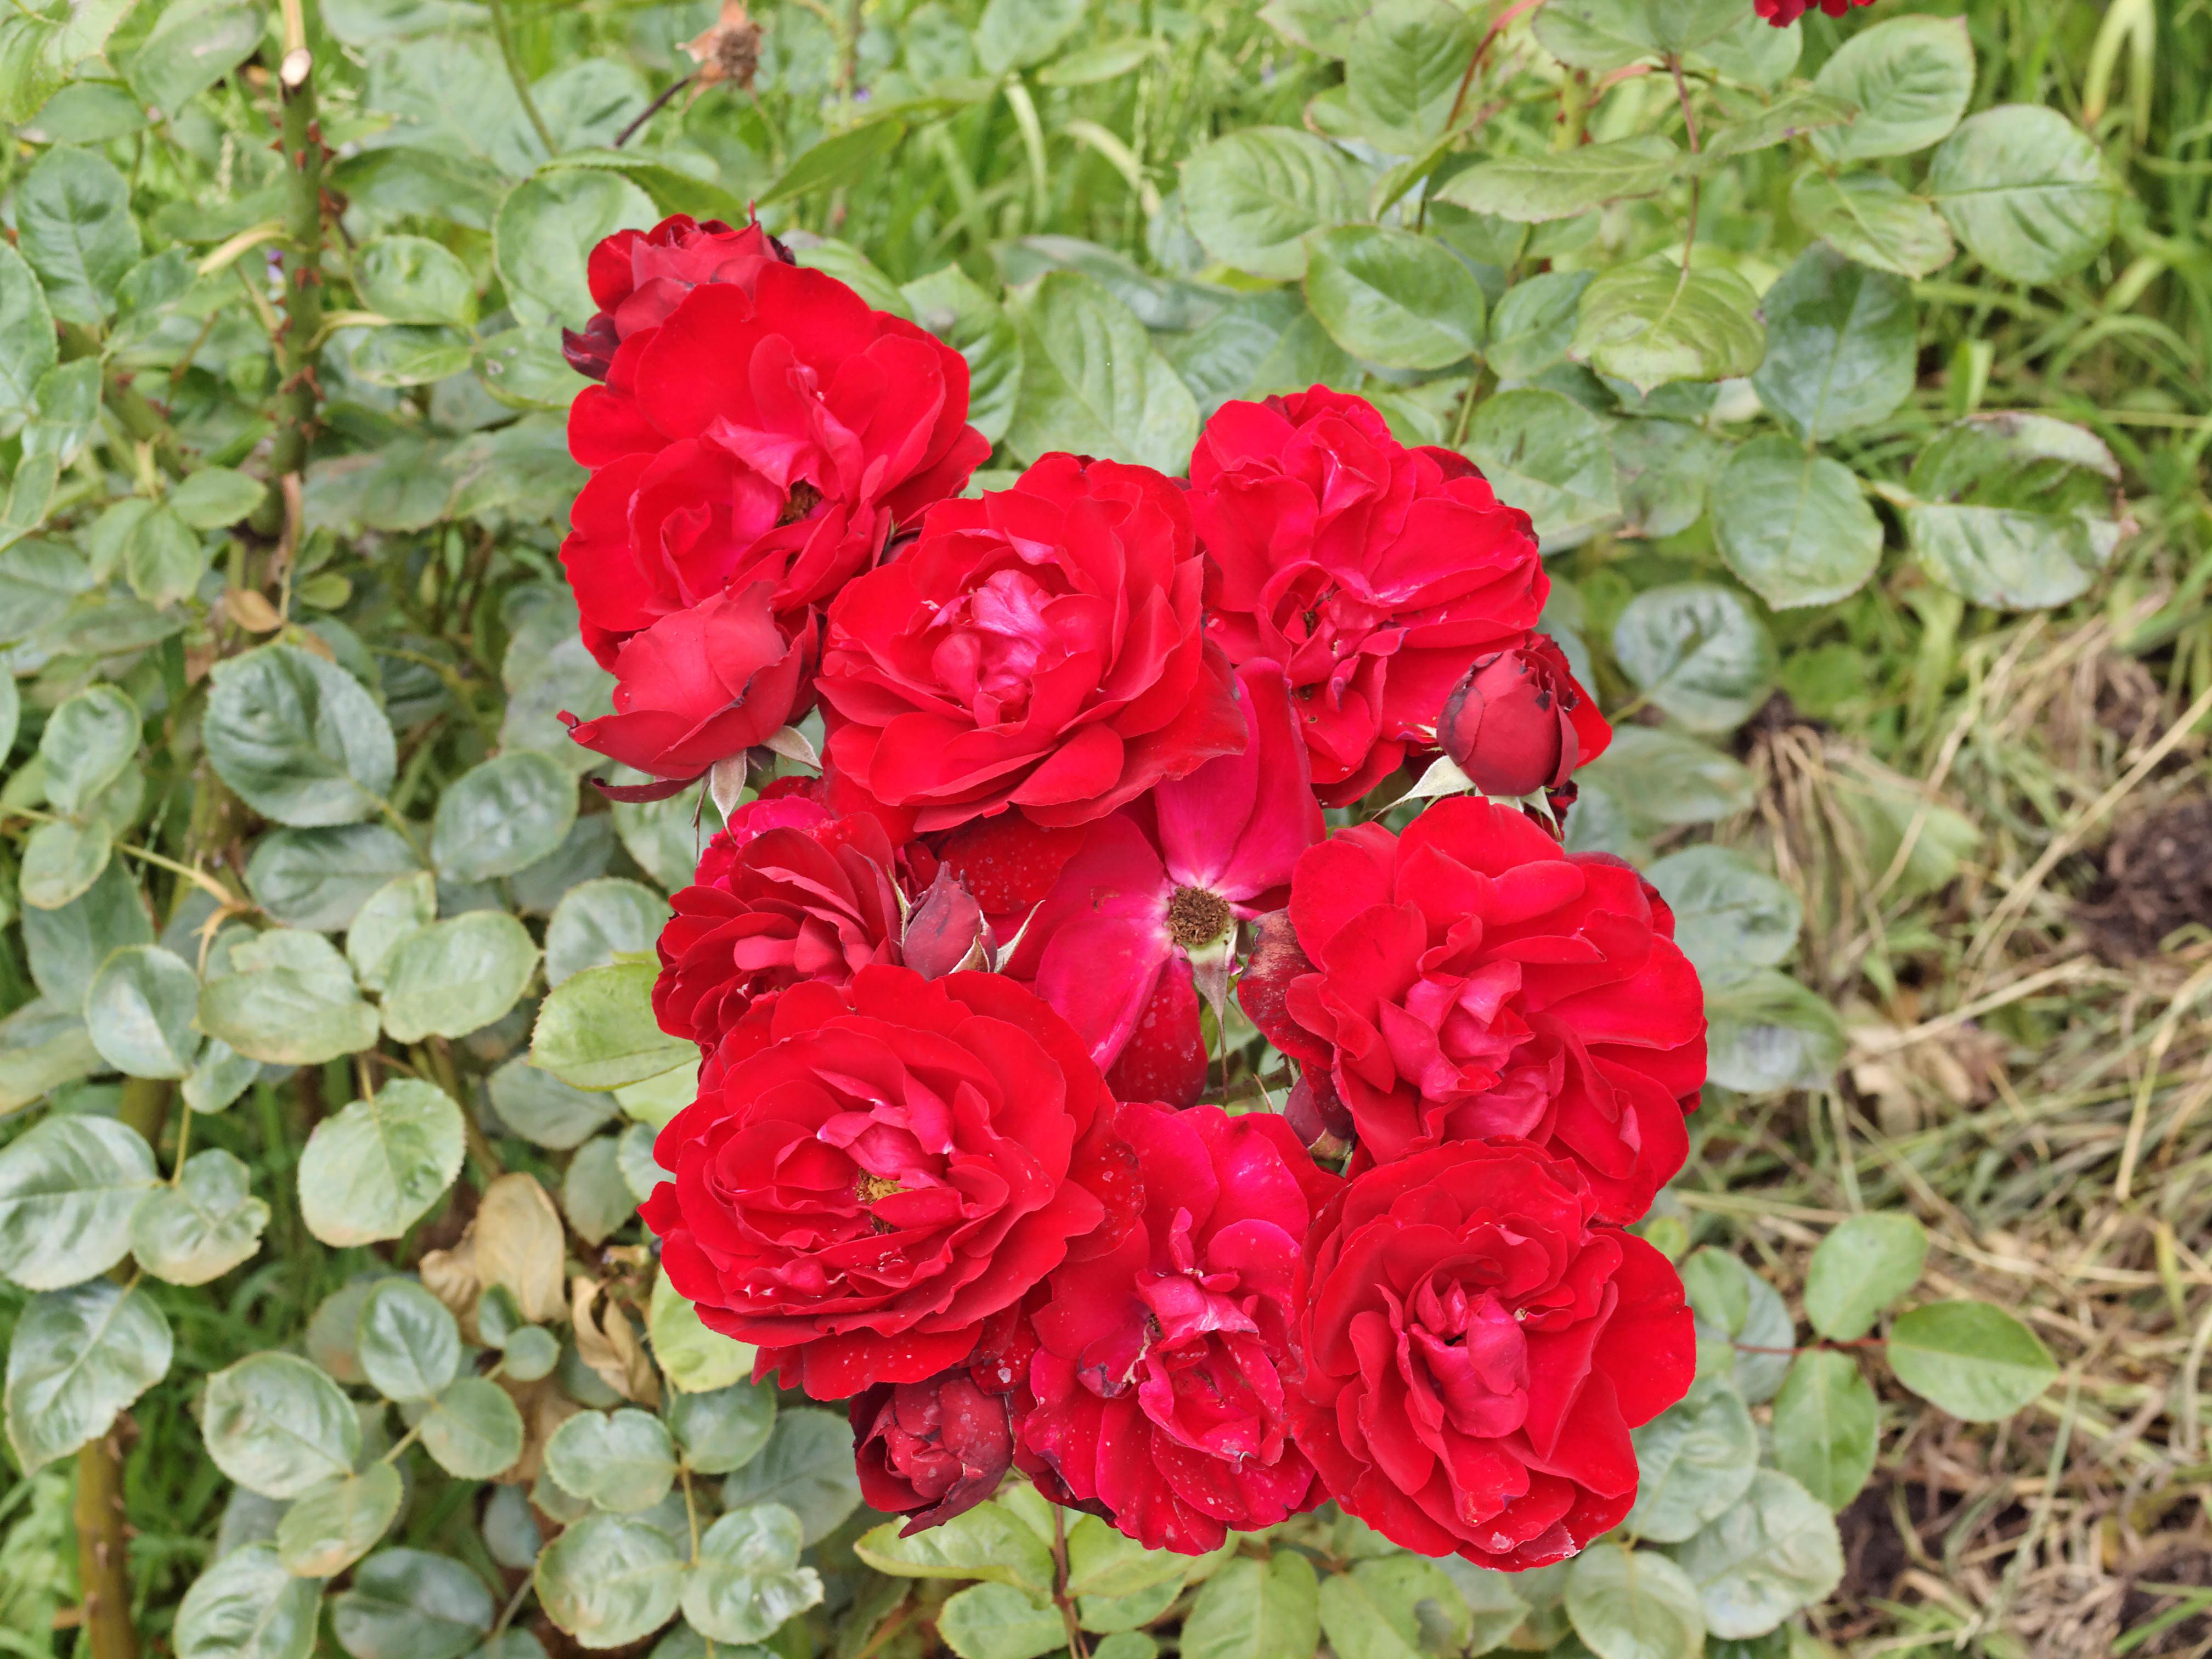 Rosa-Lilli-Marleen.jpeg